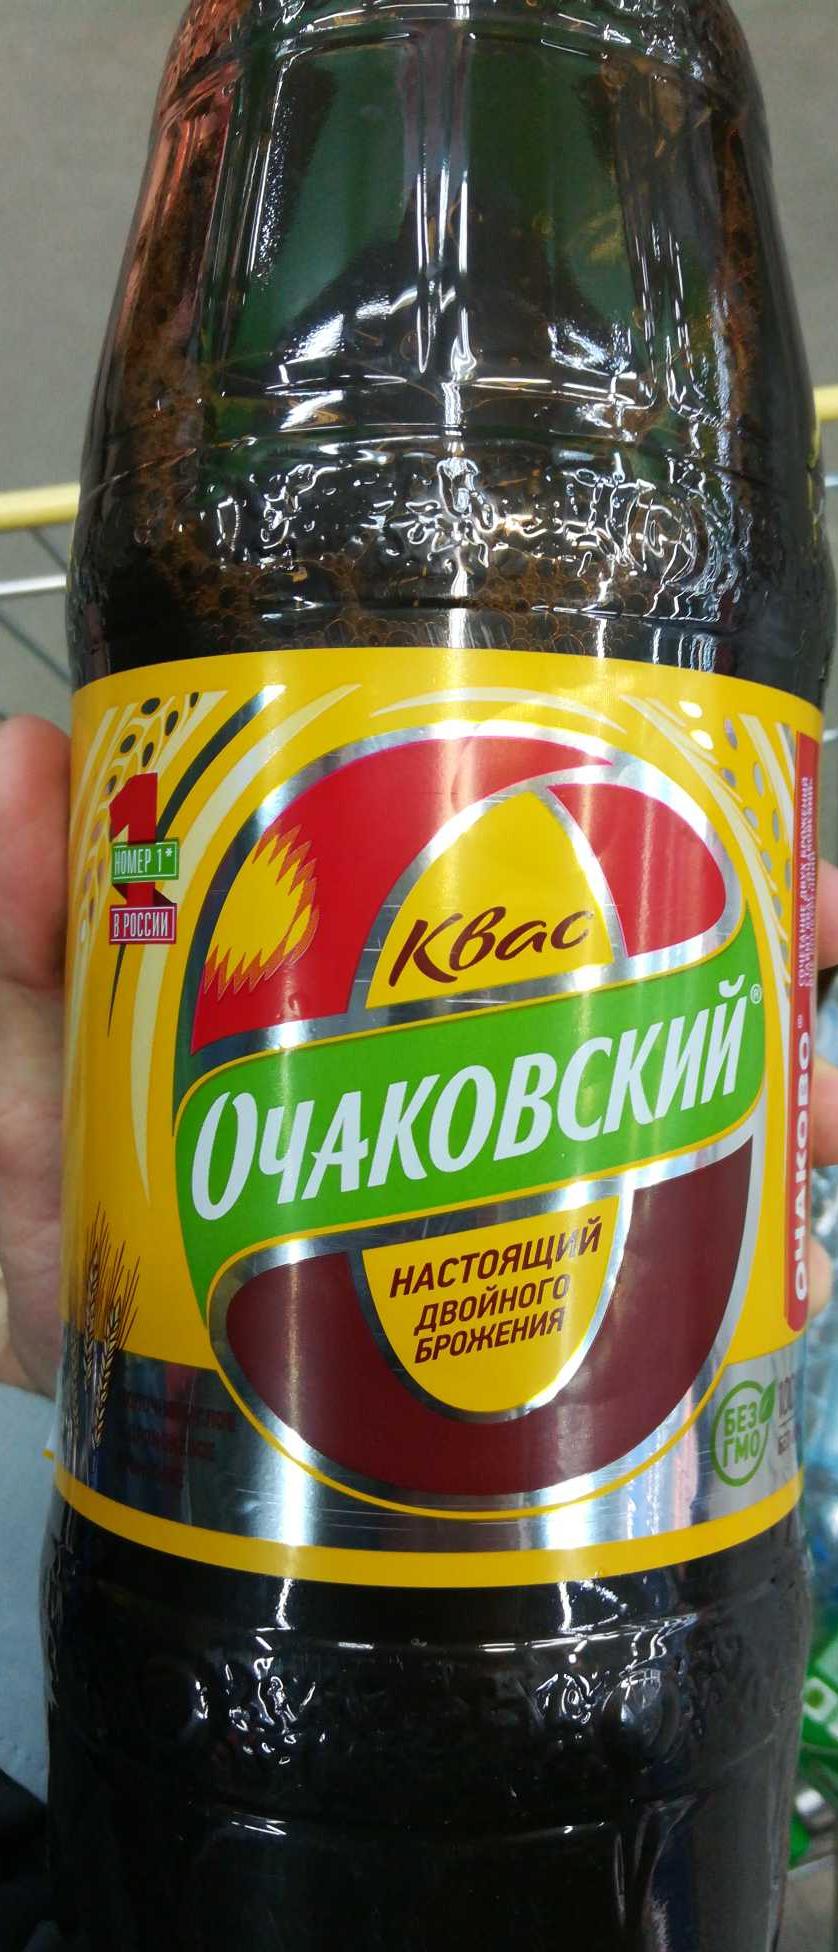 фото13 Квас Очаковский 2л.